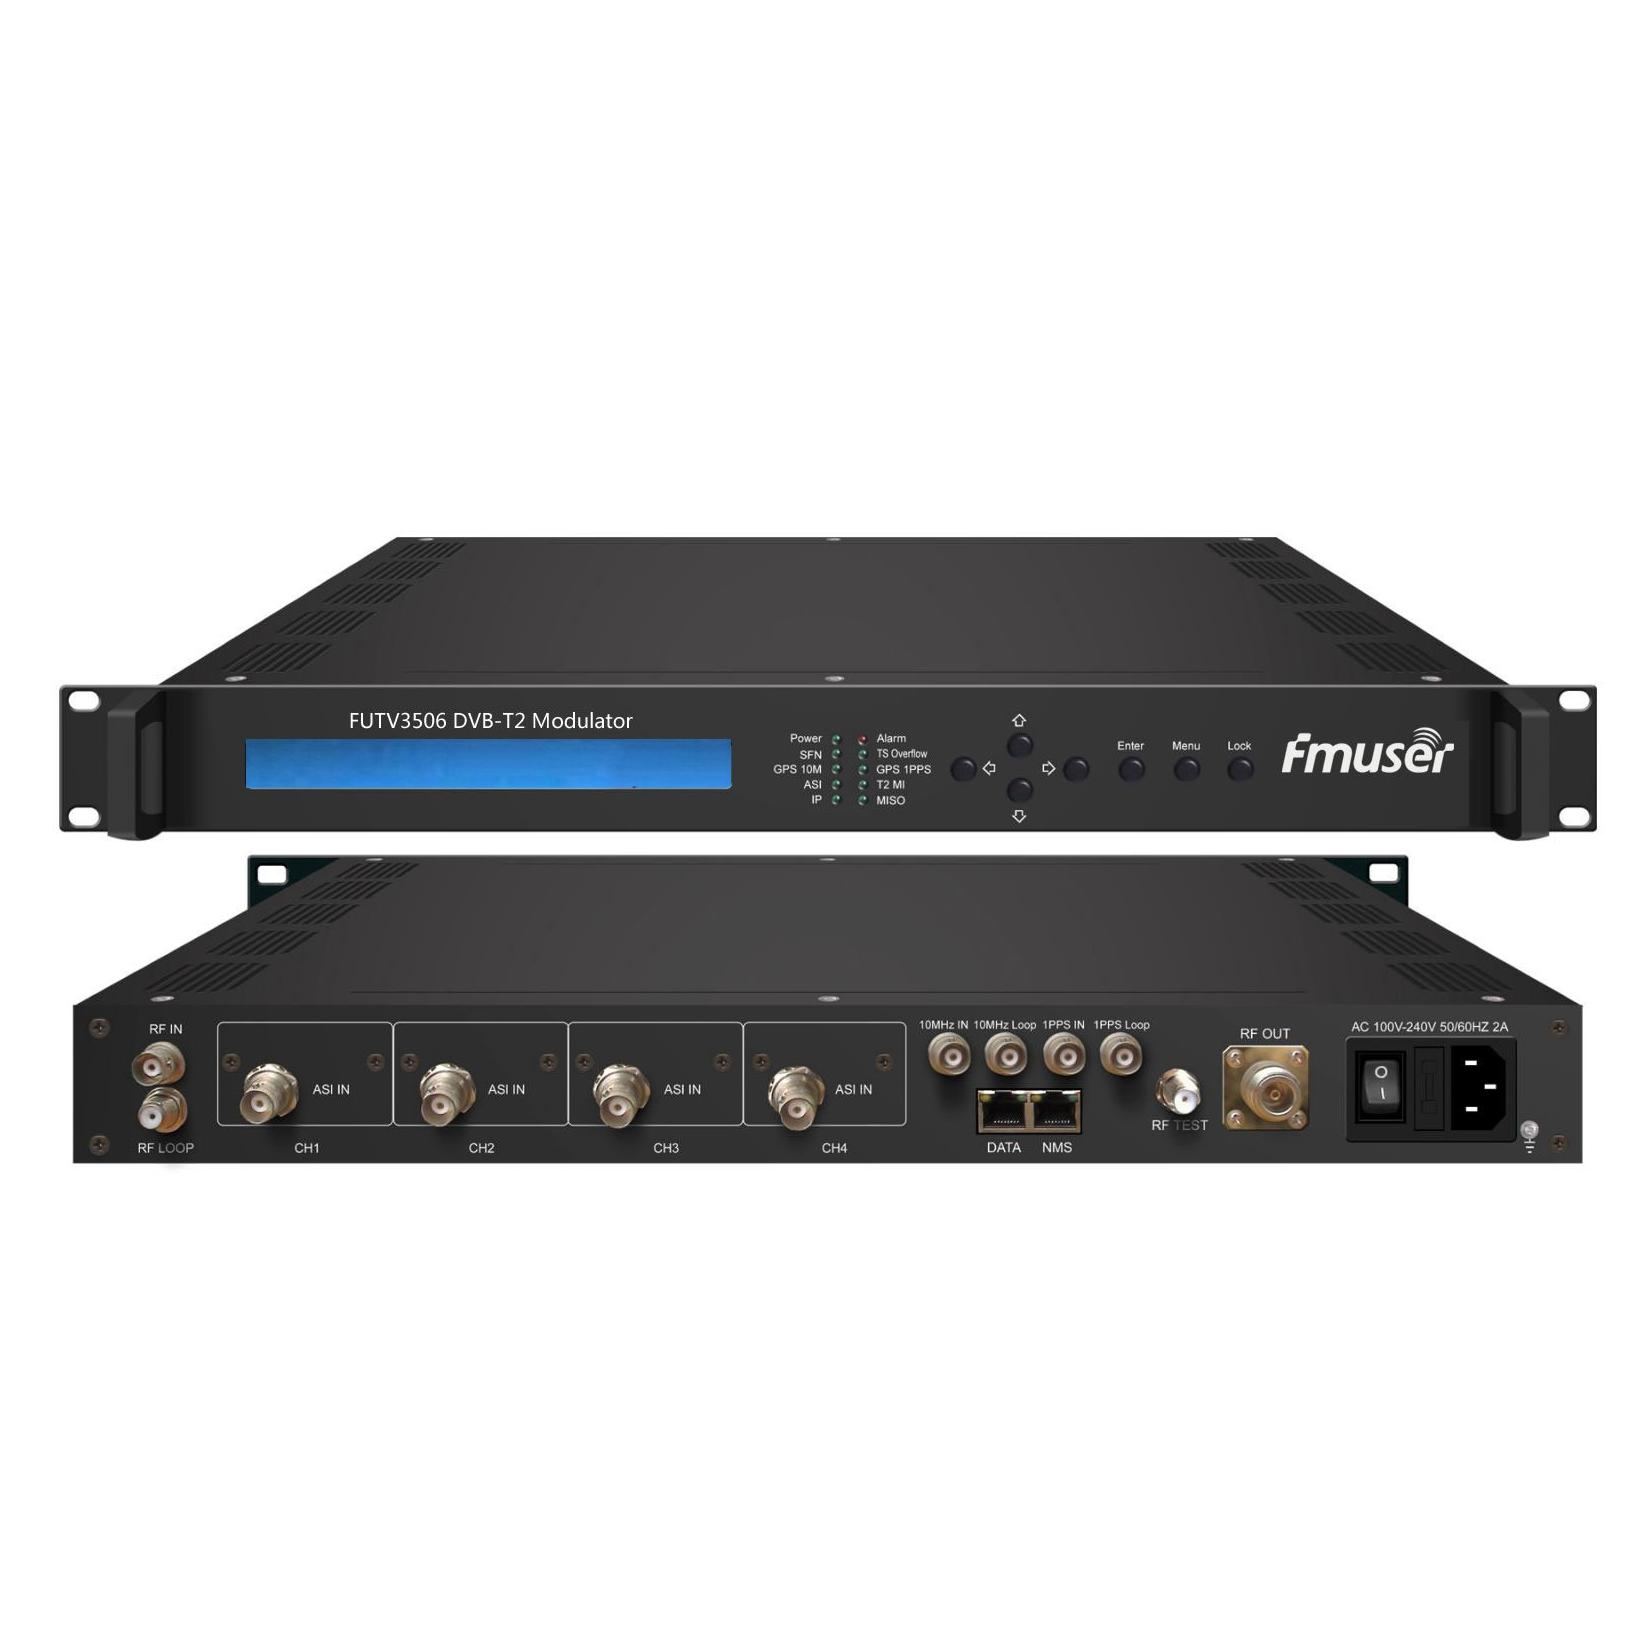 Modulador FMUSER FUTV3506 DVB-T sobre IP (entrada 2 * ASI, saída 1 * IP, QPSK / 16QAM / 64QAM / 256QAM) com sistema de rede